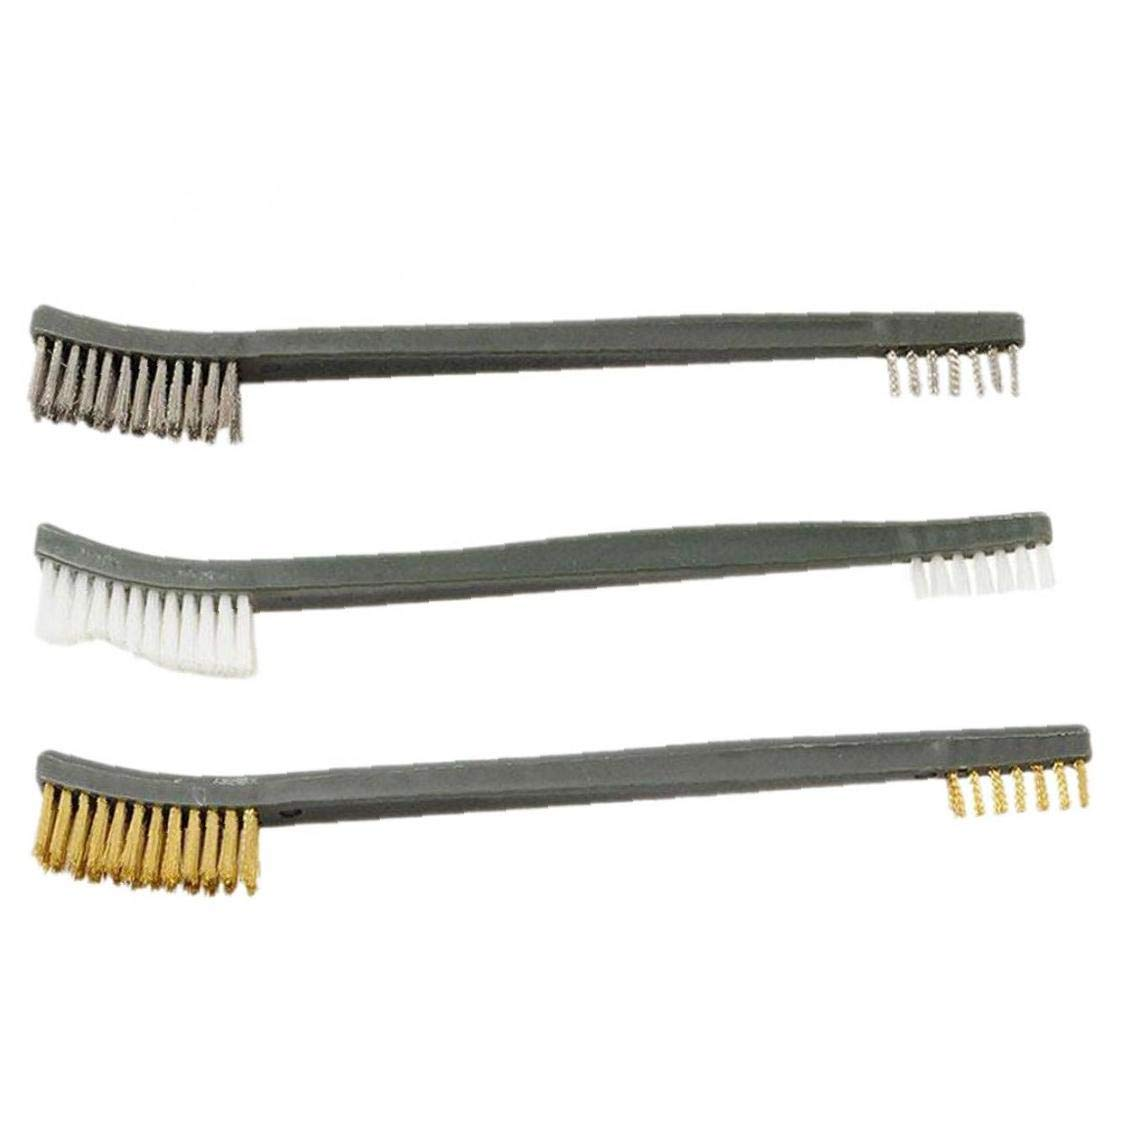 3 Pcs Mini Sistema De Cepillo De Alambre De Acero Lat/ón Pulido De Limpieza De Nylon Detalle Metal Moho Cepillo Escalada Senderismo Multifuncional Cepillo De Limpieza